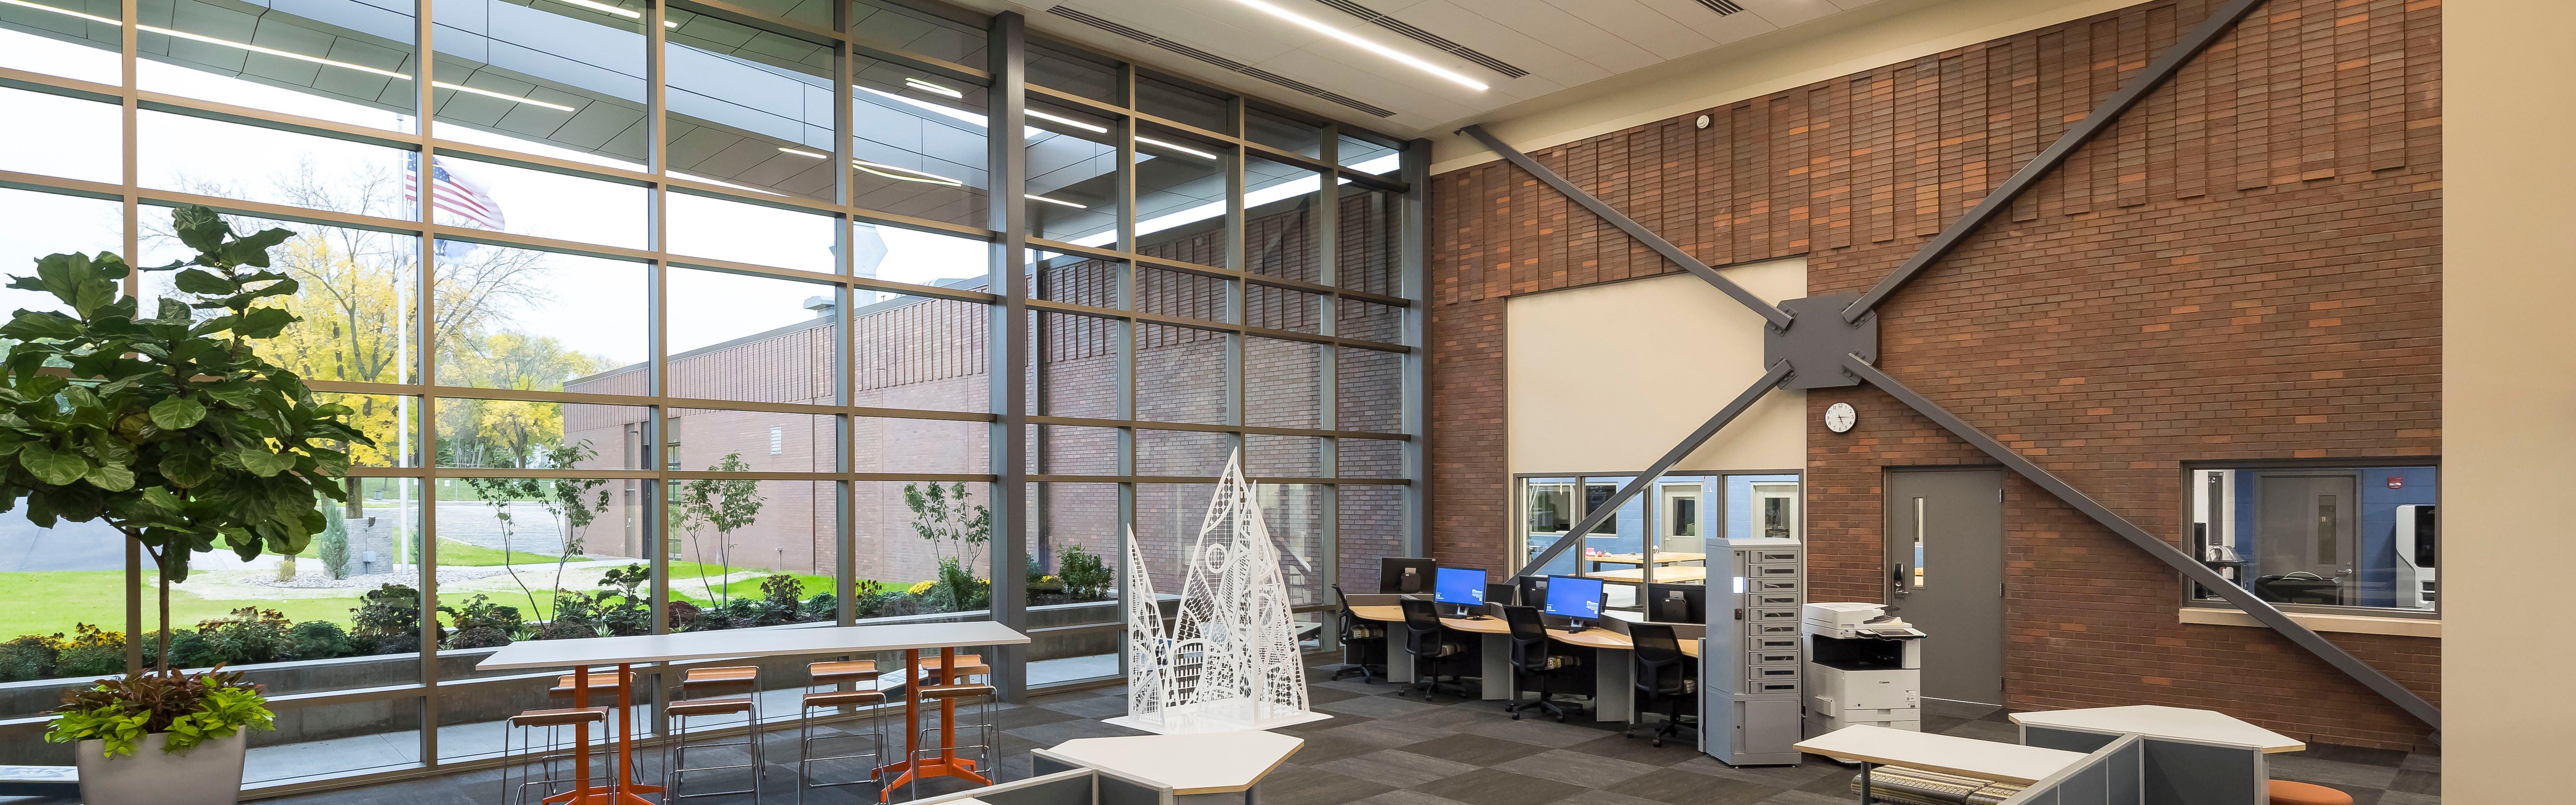 NWTC Trades Engineering Technologies